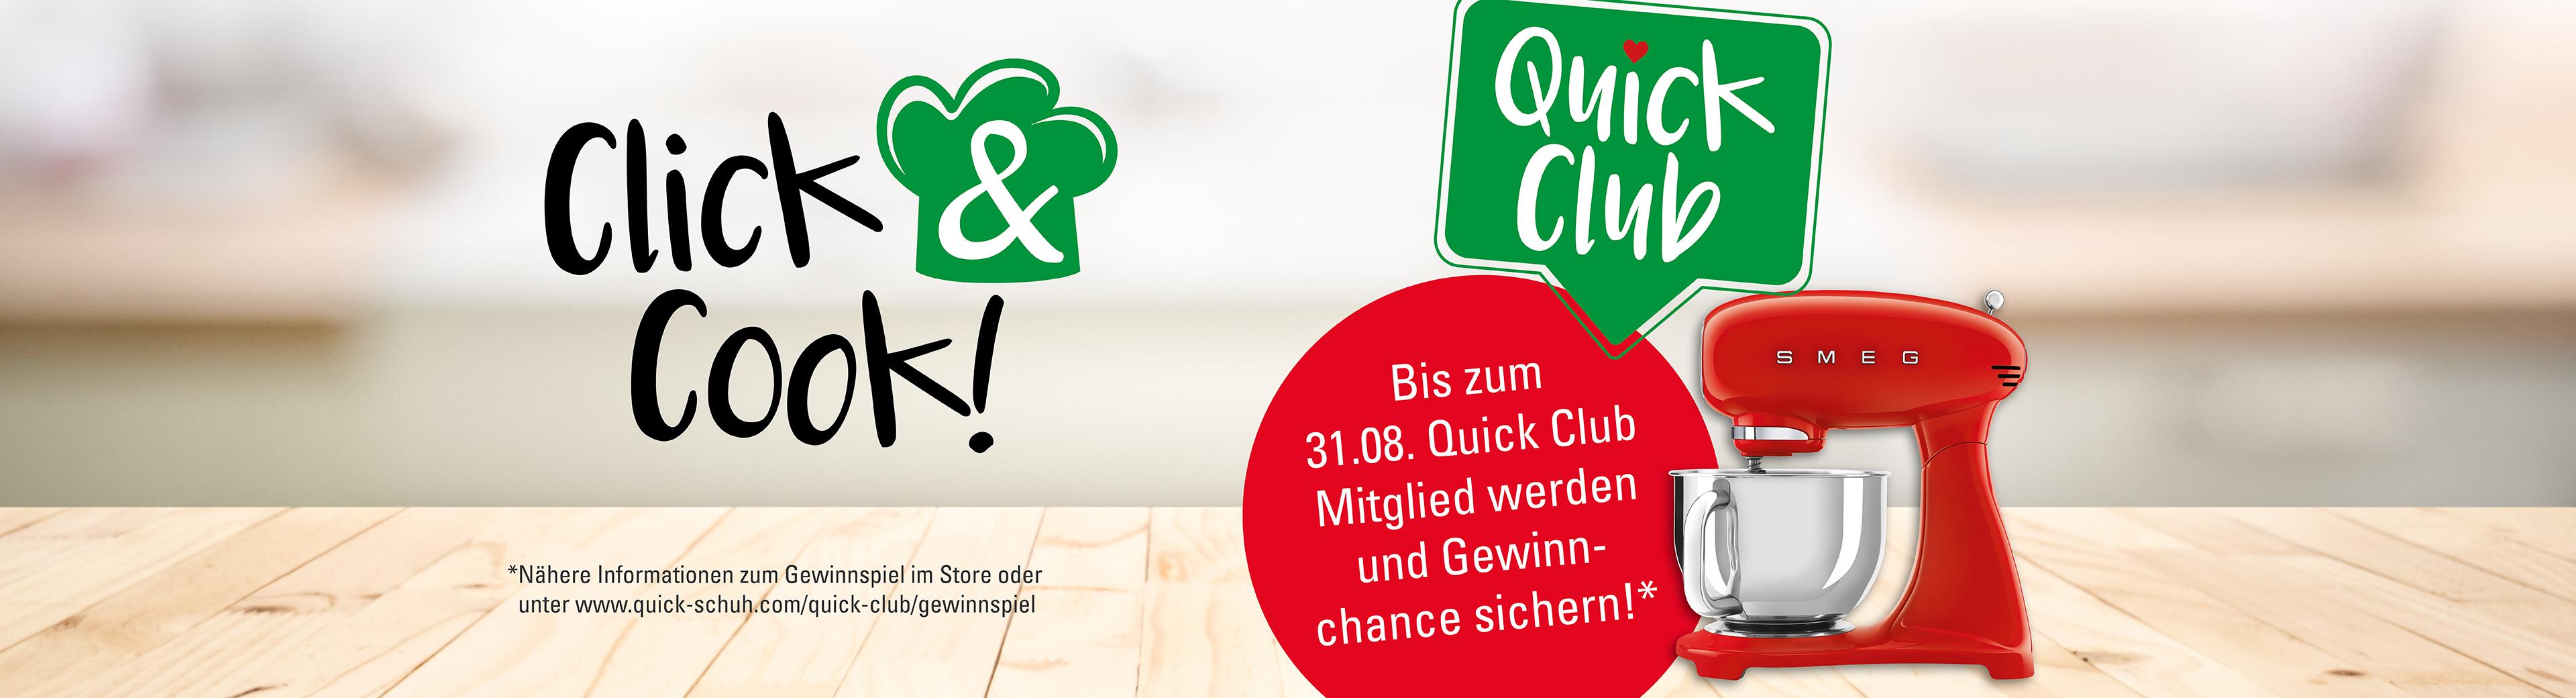 QS_Club_Einfuehrung_Homepage_3840x1040